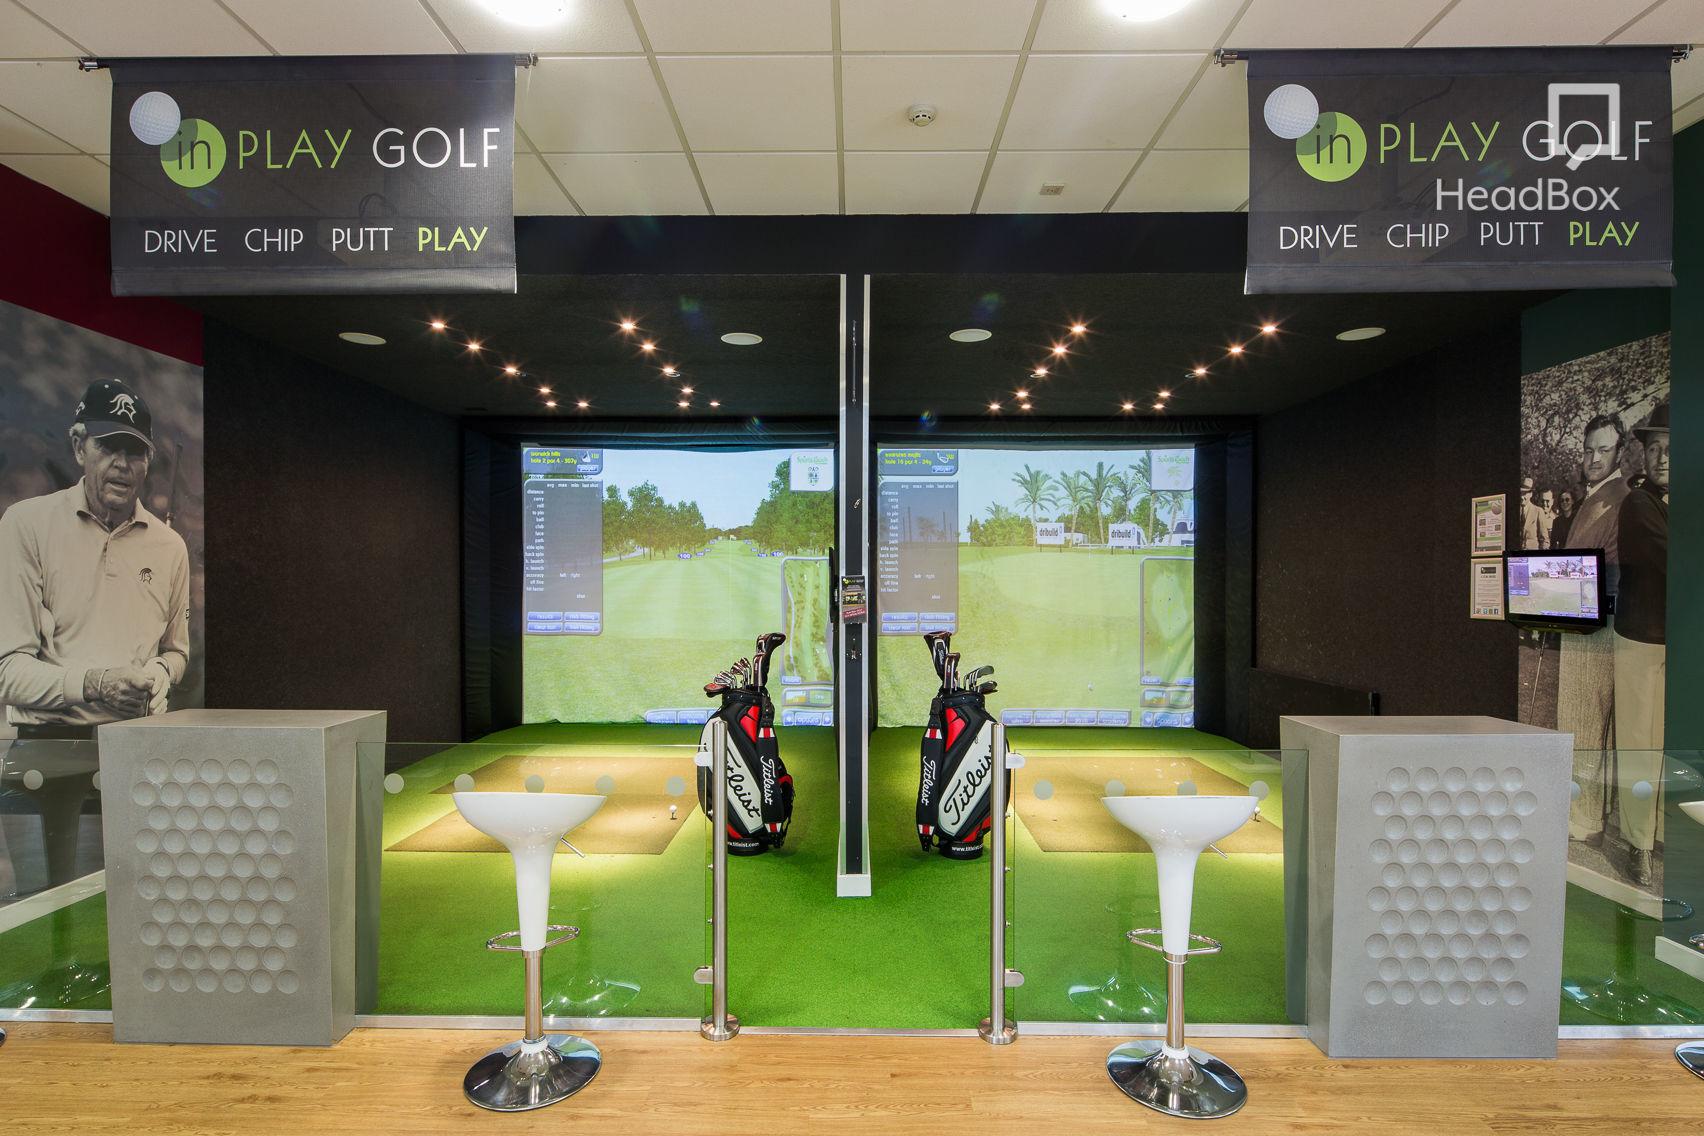 Exclusive Vene Hire, inPlay Golf